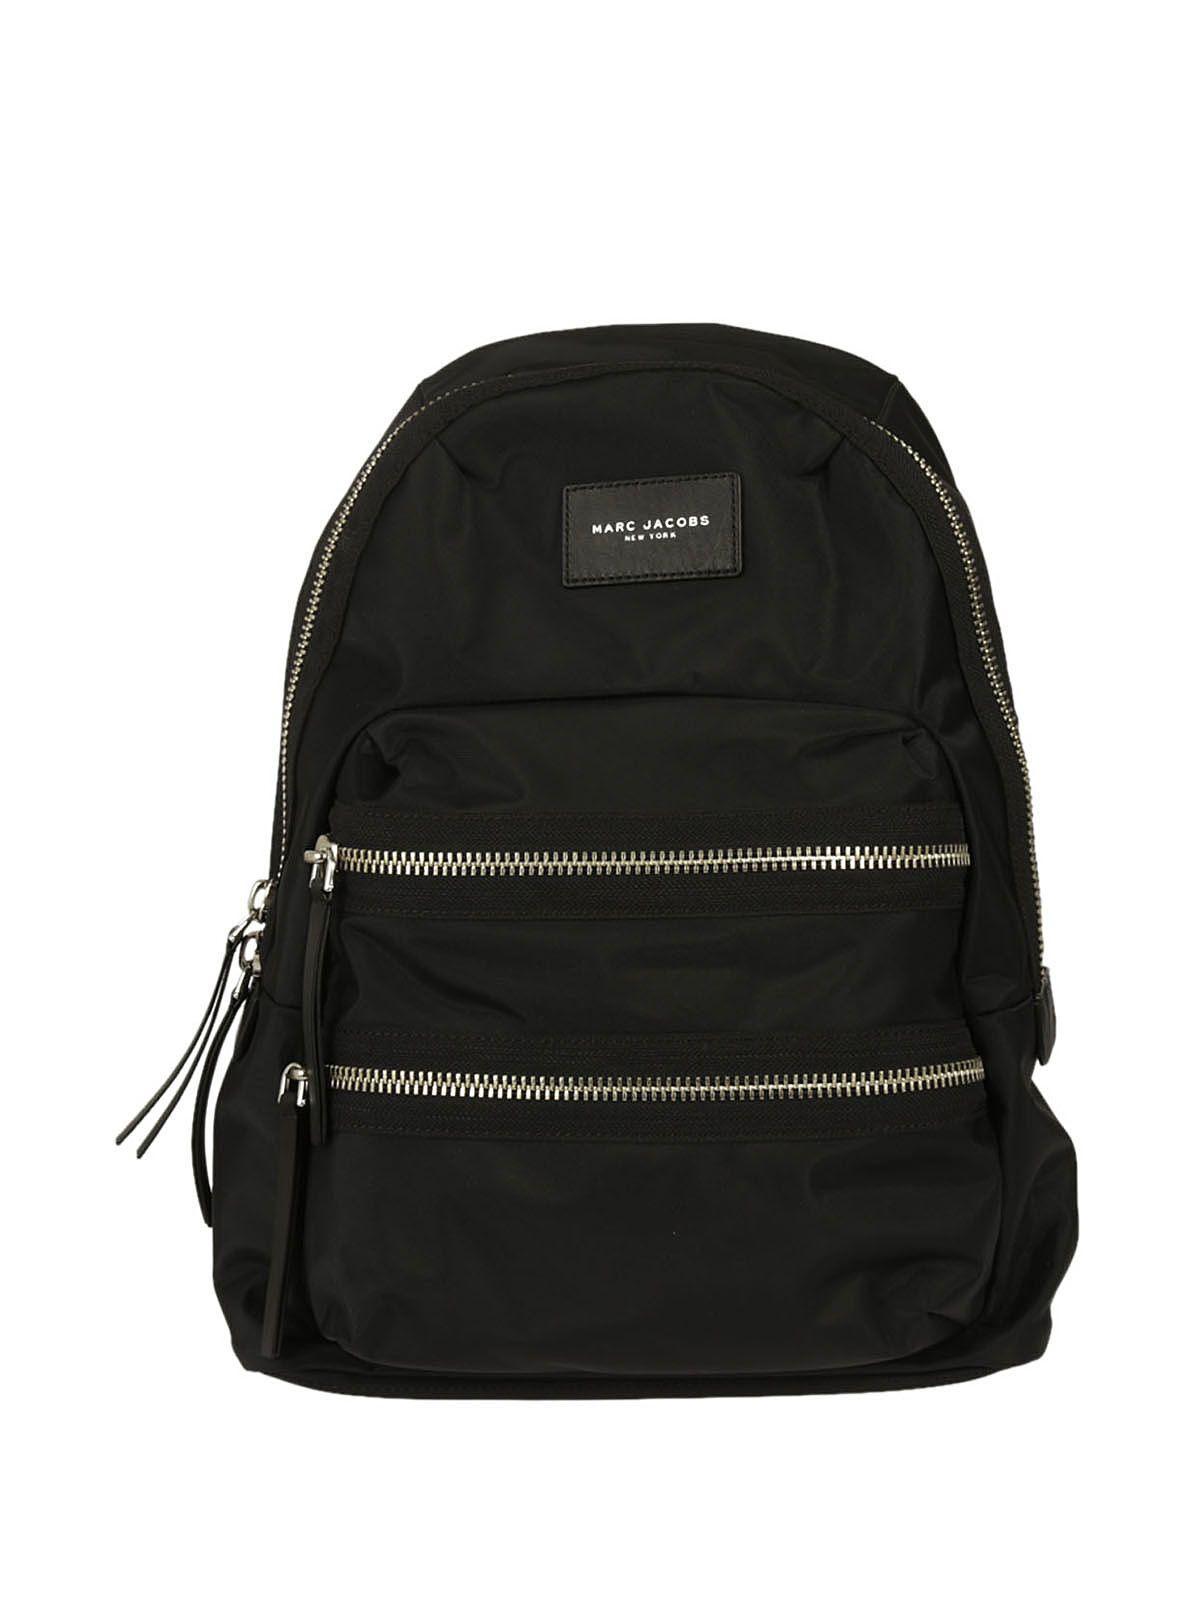 Marc Jacobs Biker Backpack In Black